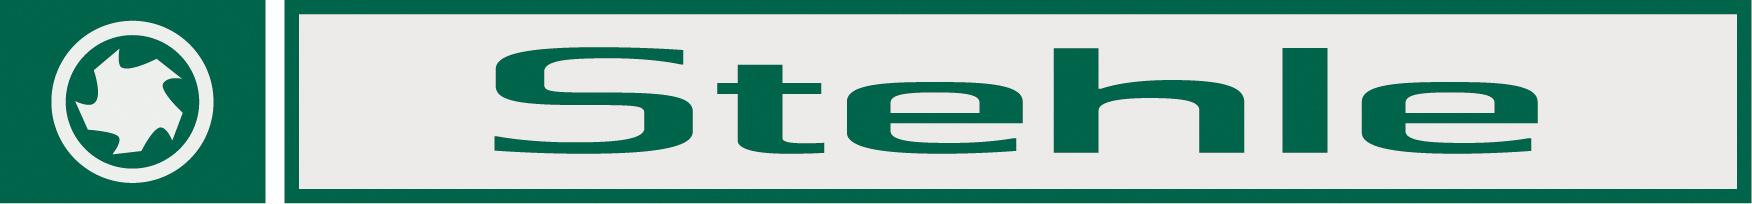 https://0201.nccdn.net/1_2/000/000/131/e15/Stehle_Logo.jpg